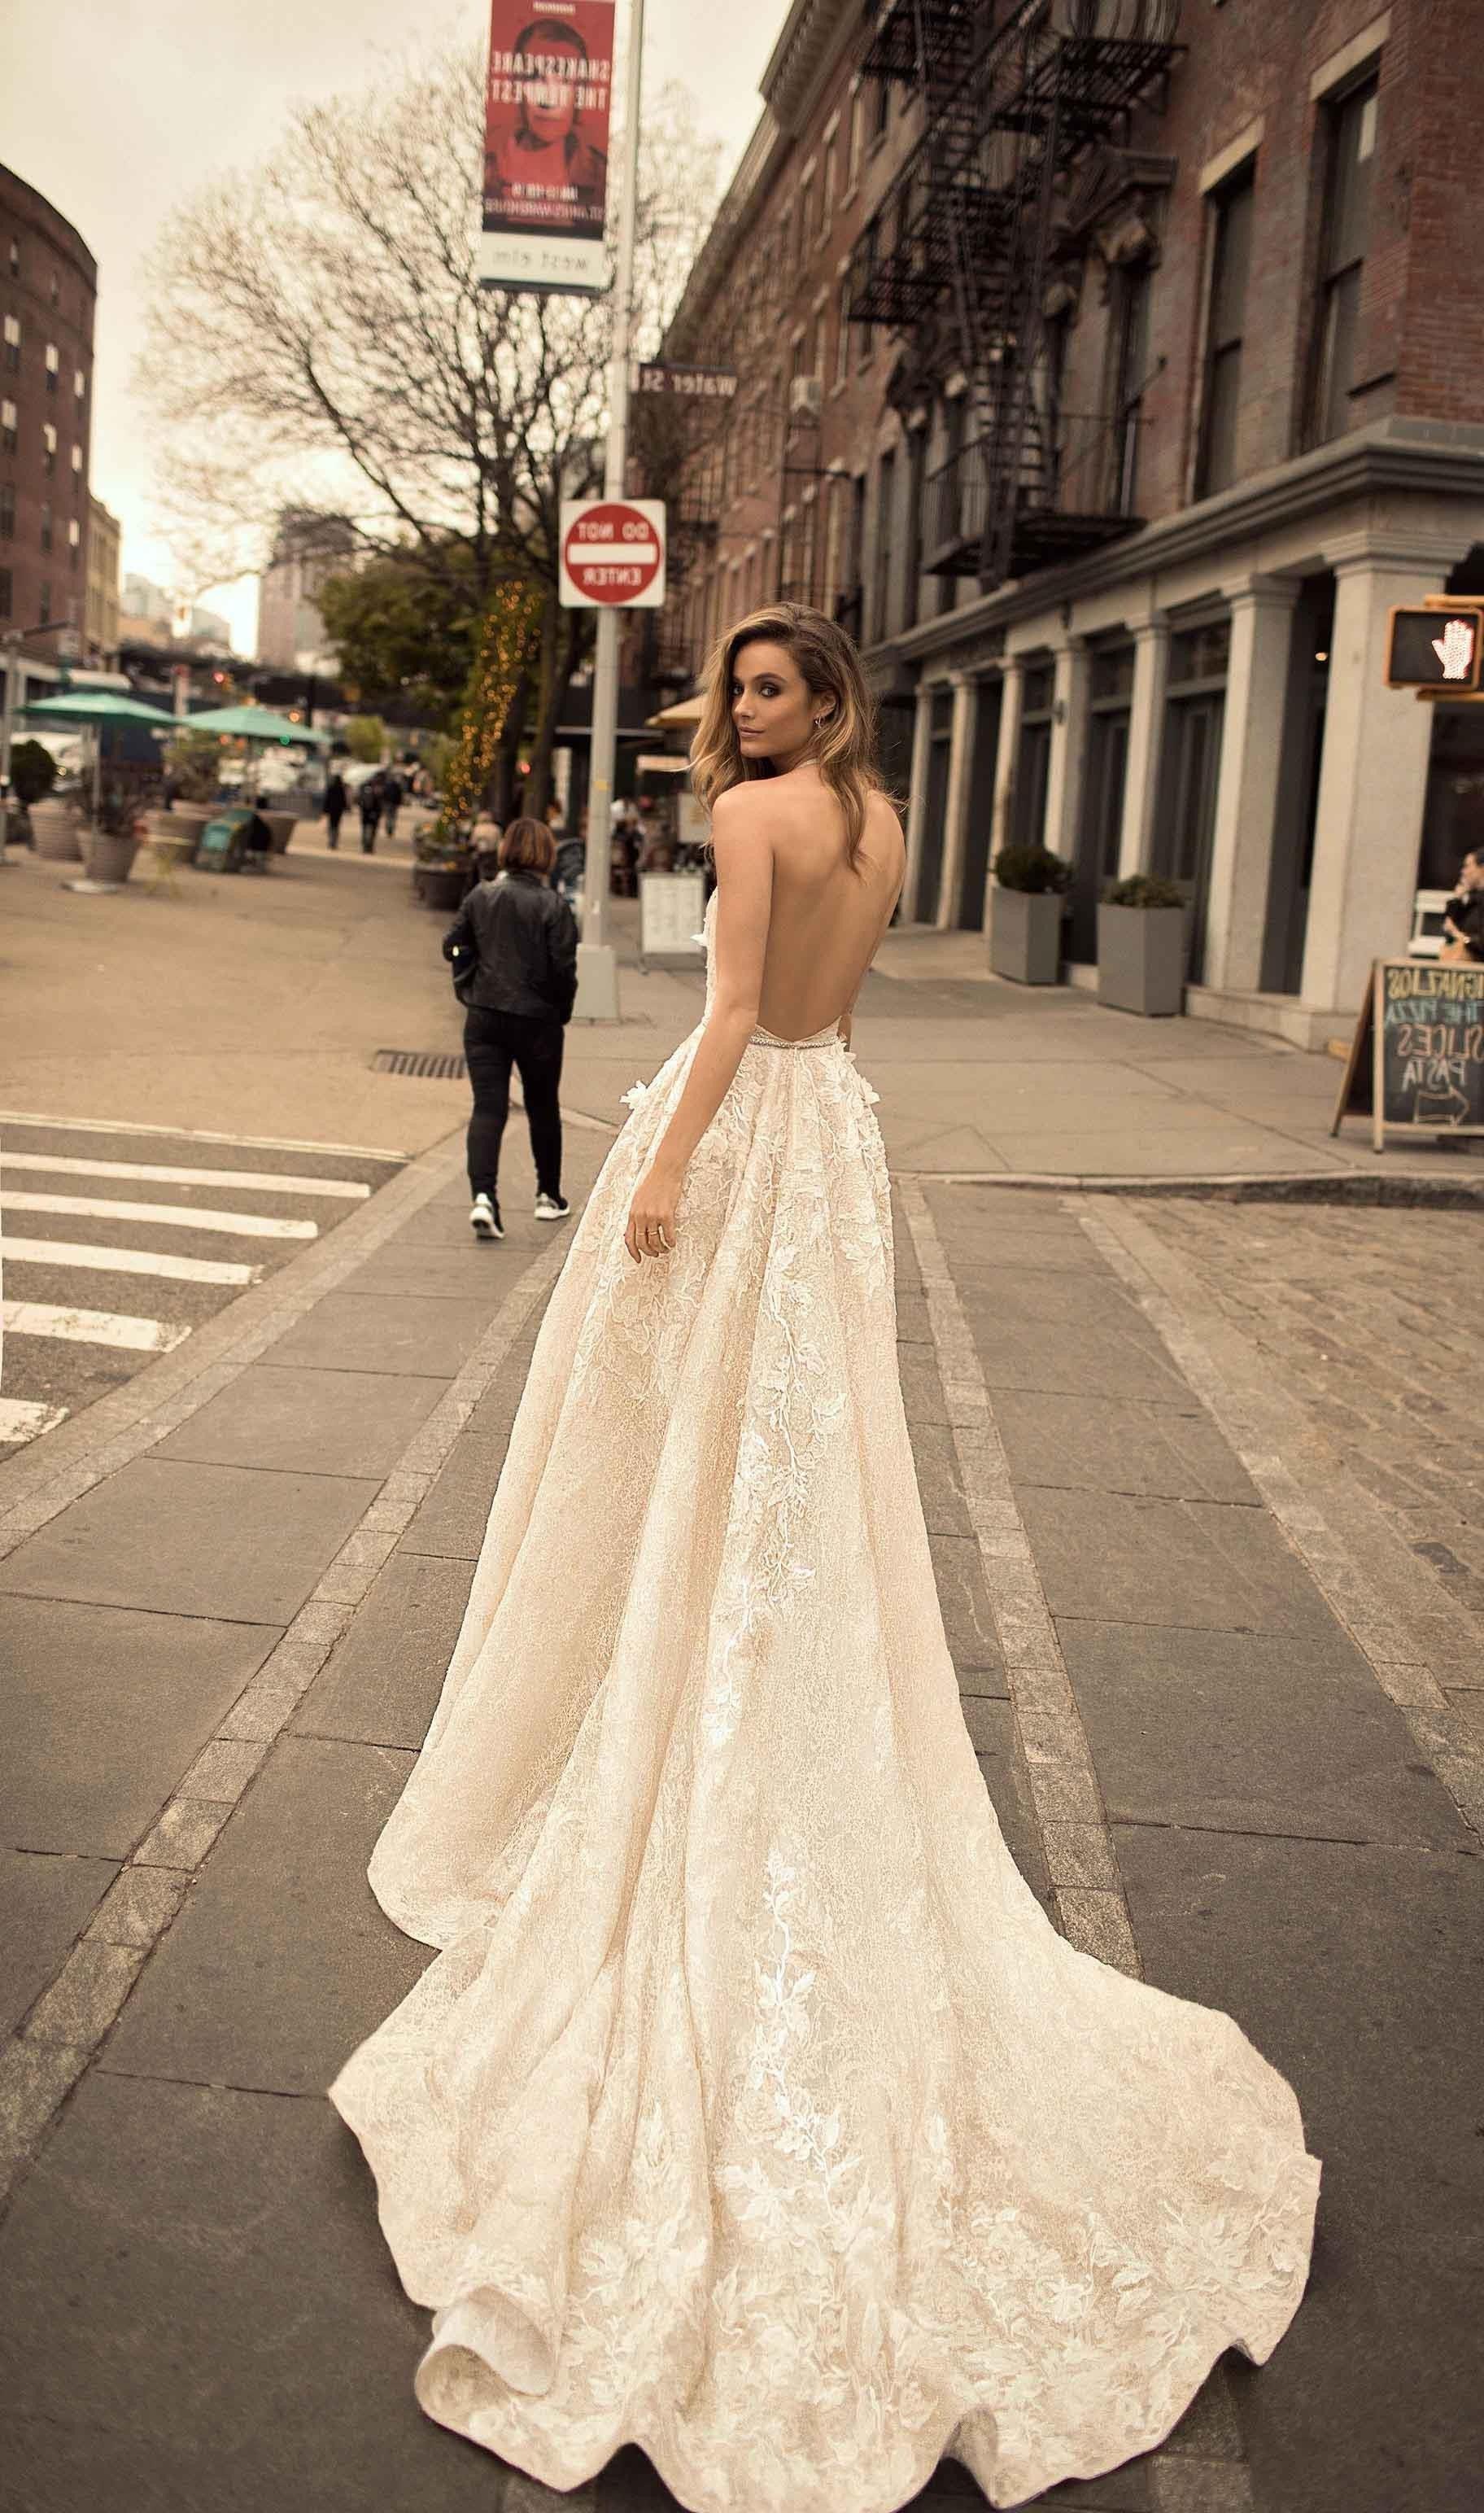 Bentuk Model Bridesmaid Hijab 9ddf Wedding Ideas White and Gold Wedding Dress the Newest